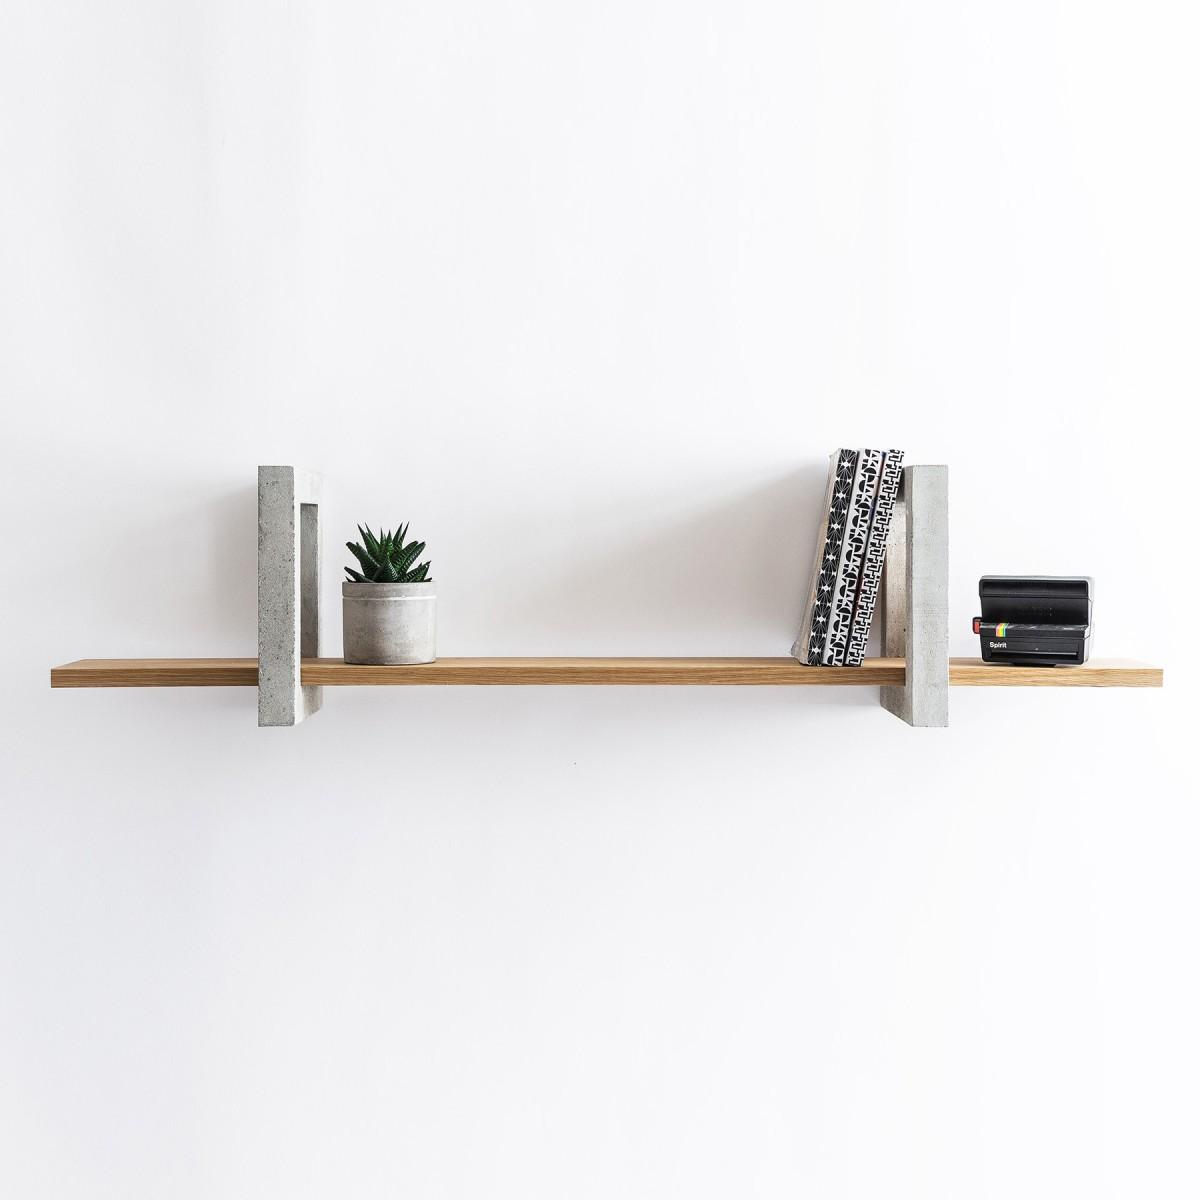 Kardamov Studio - Olo Wandregal